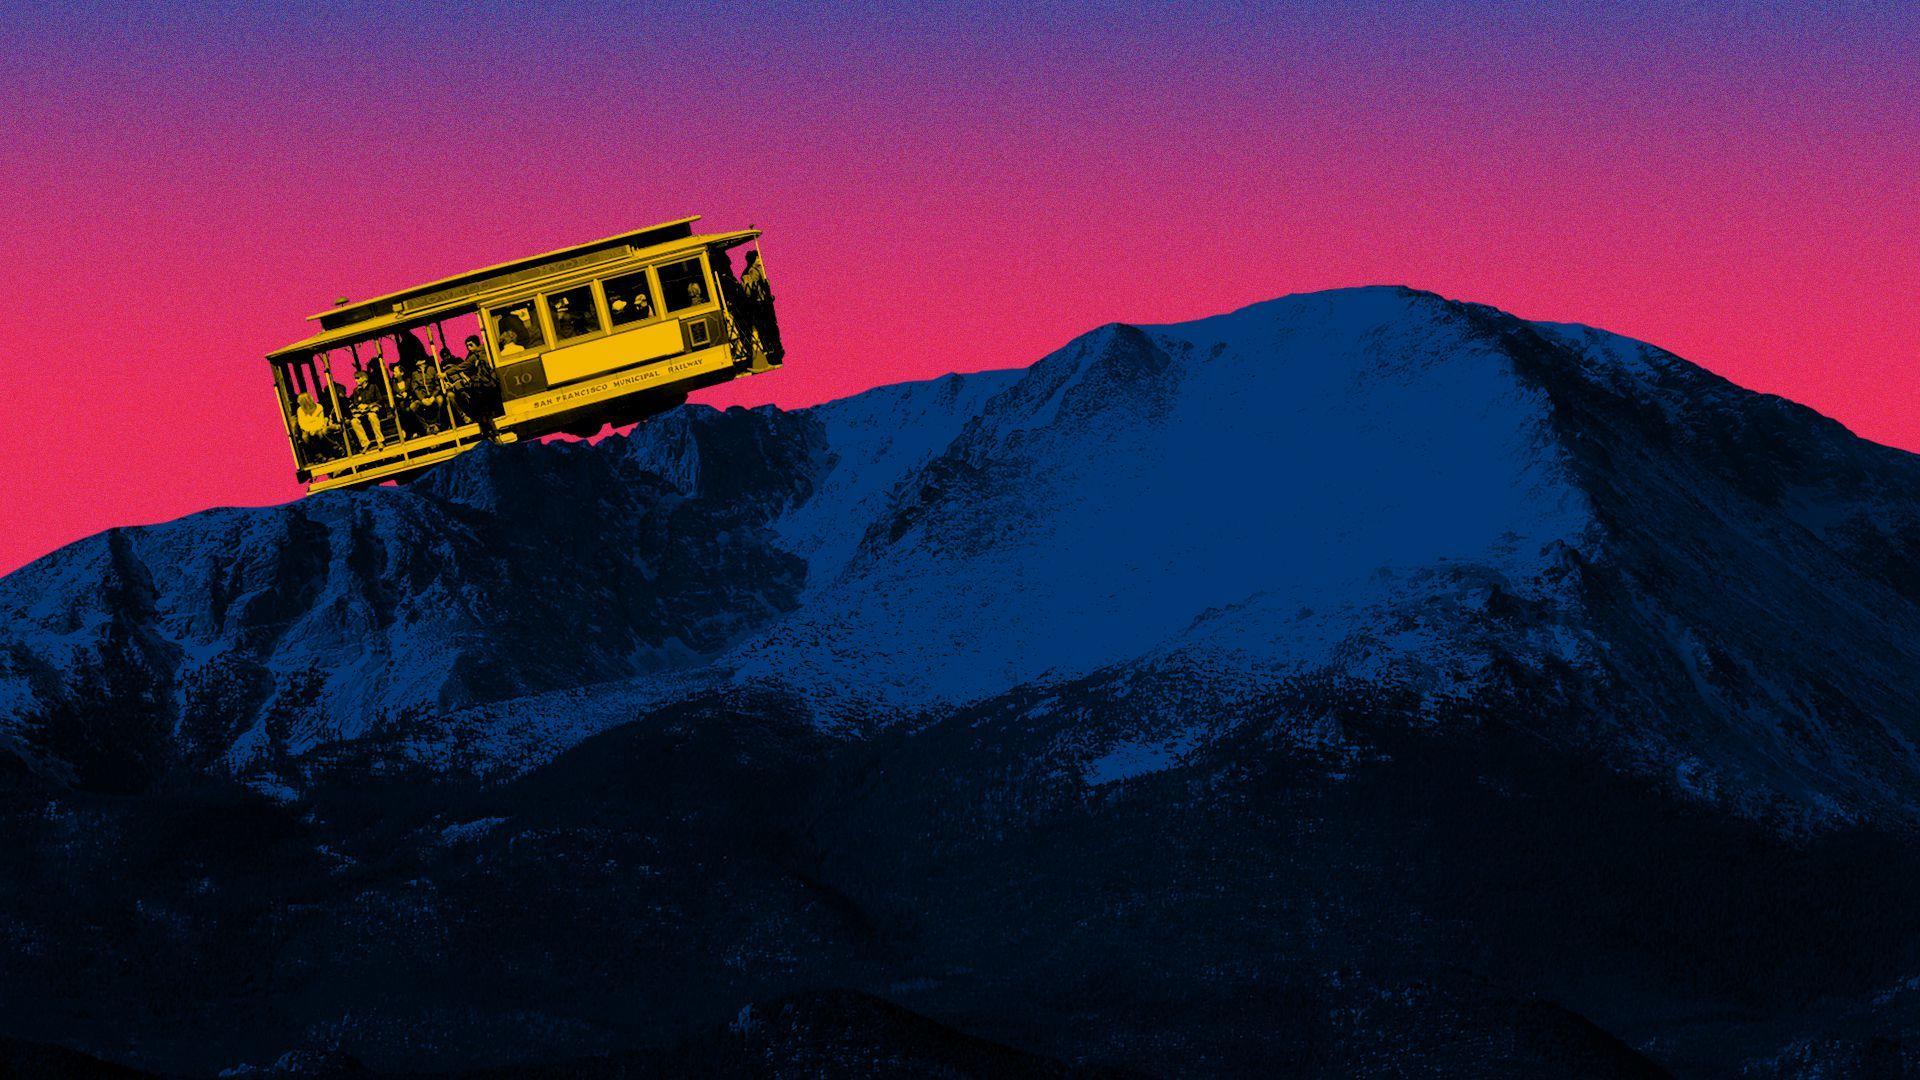 Photo illustration of a San Francisco trolley climbing a mountain.